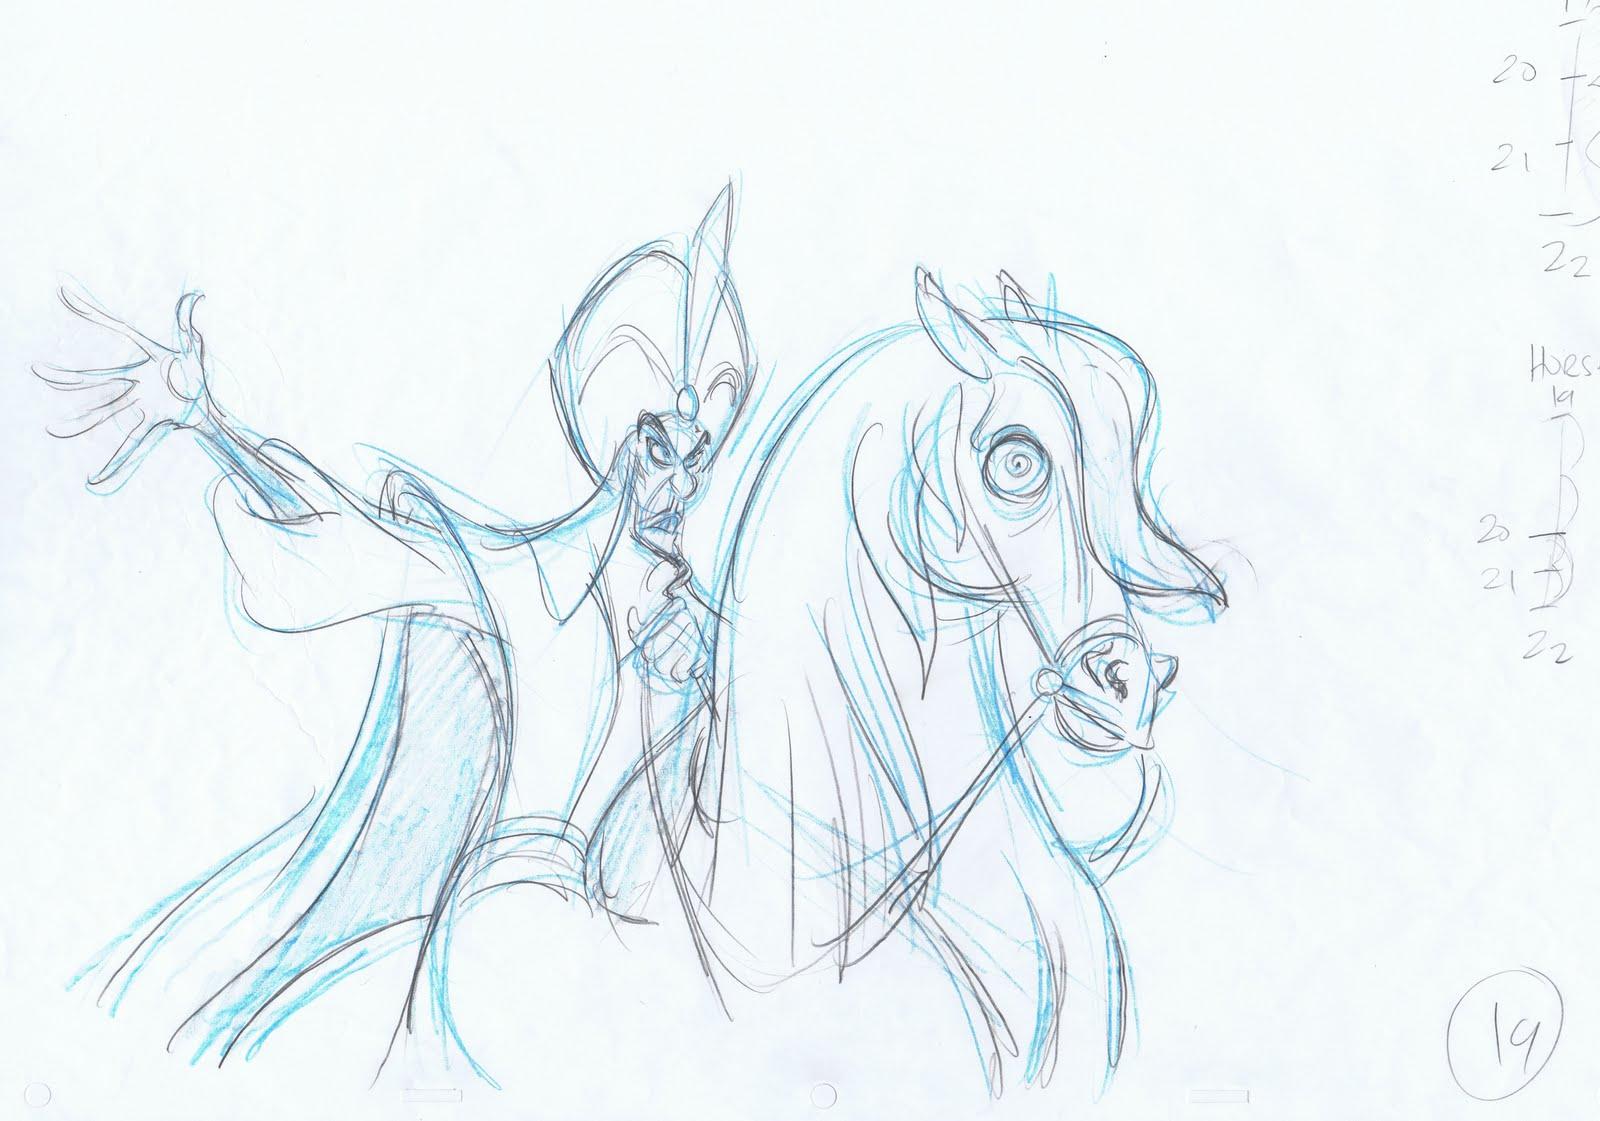 aladdin_production_drawing_andreas_deja_5.jpg